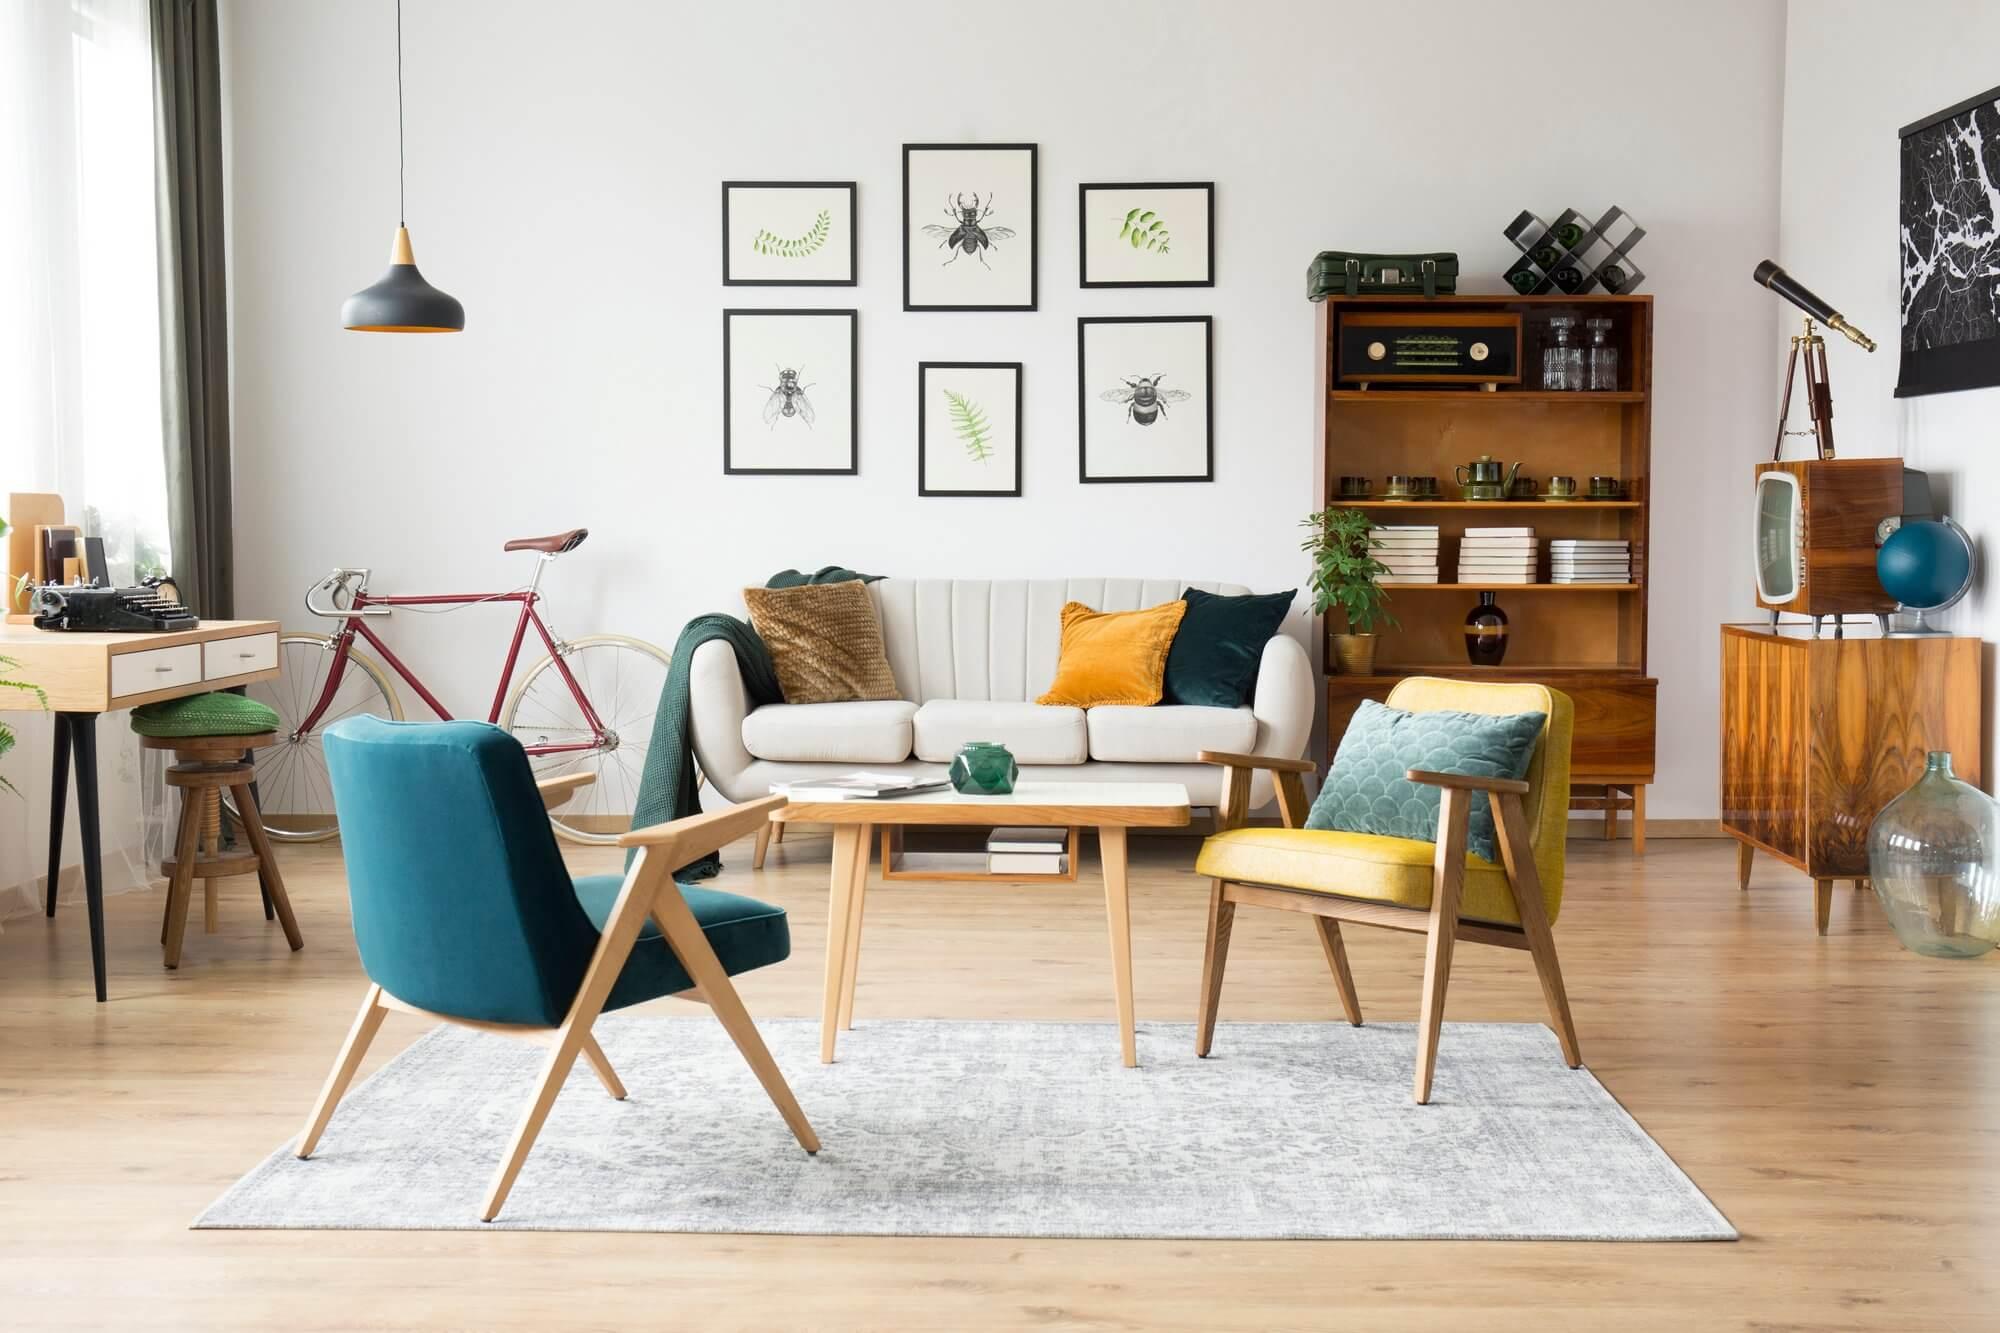 Mid-Century Modern - Living Room Decorating Ideas